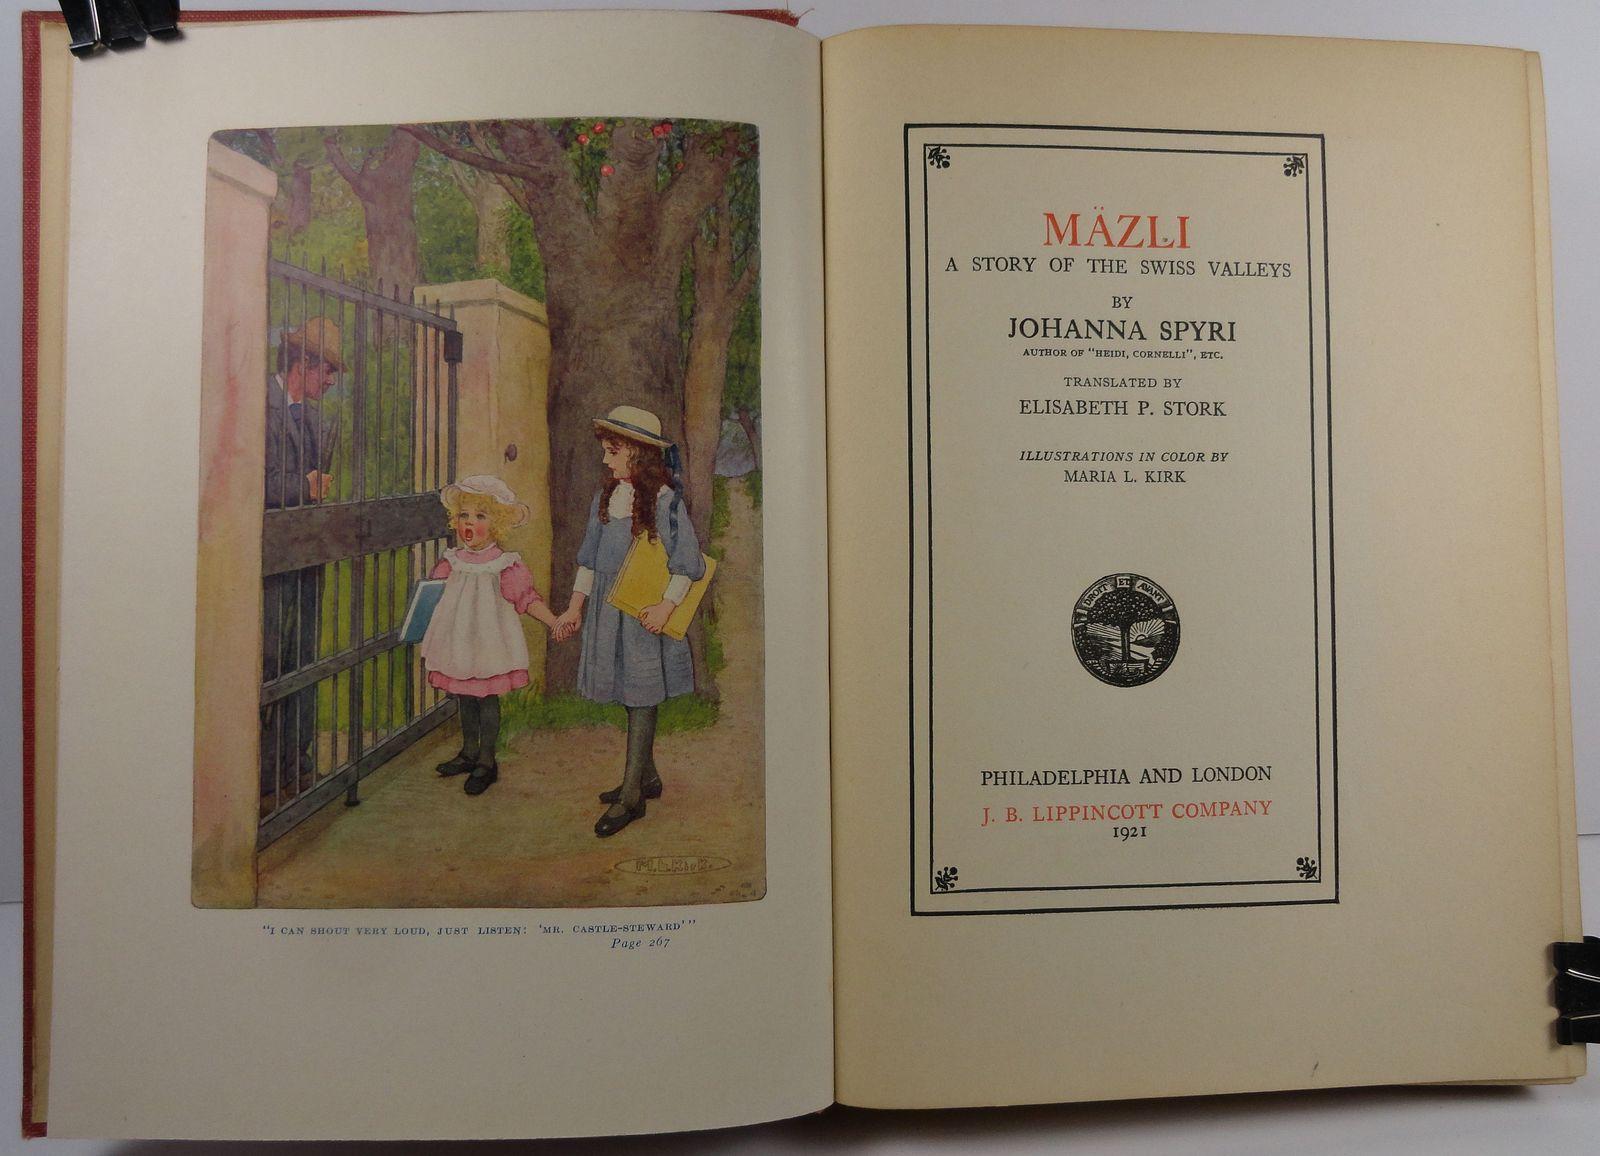 Mazli A Story of the Swiss Valleys by Johanna Spyri